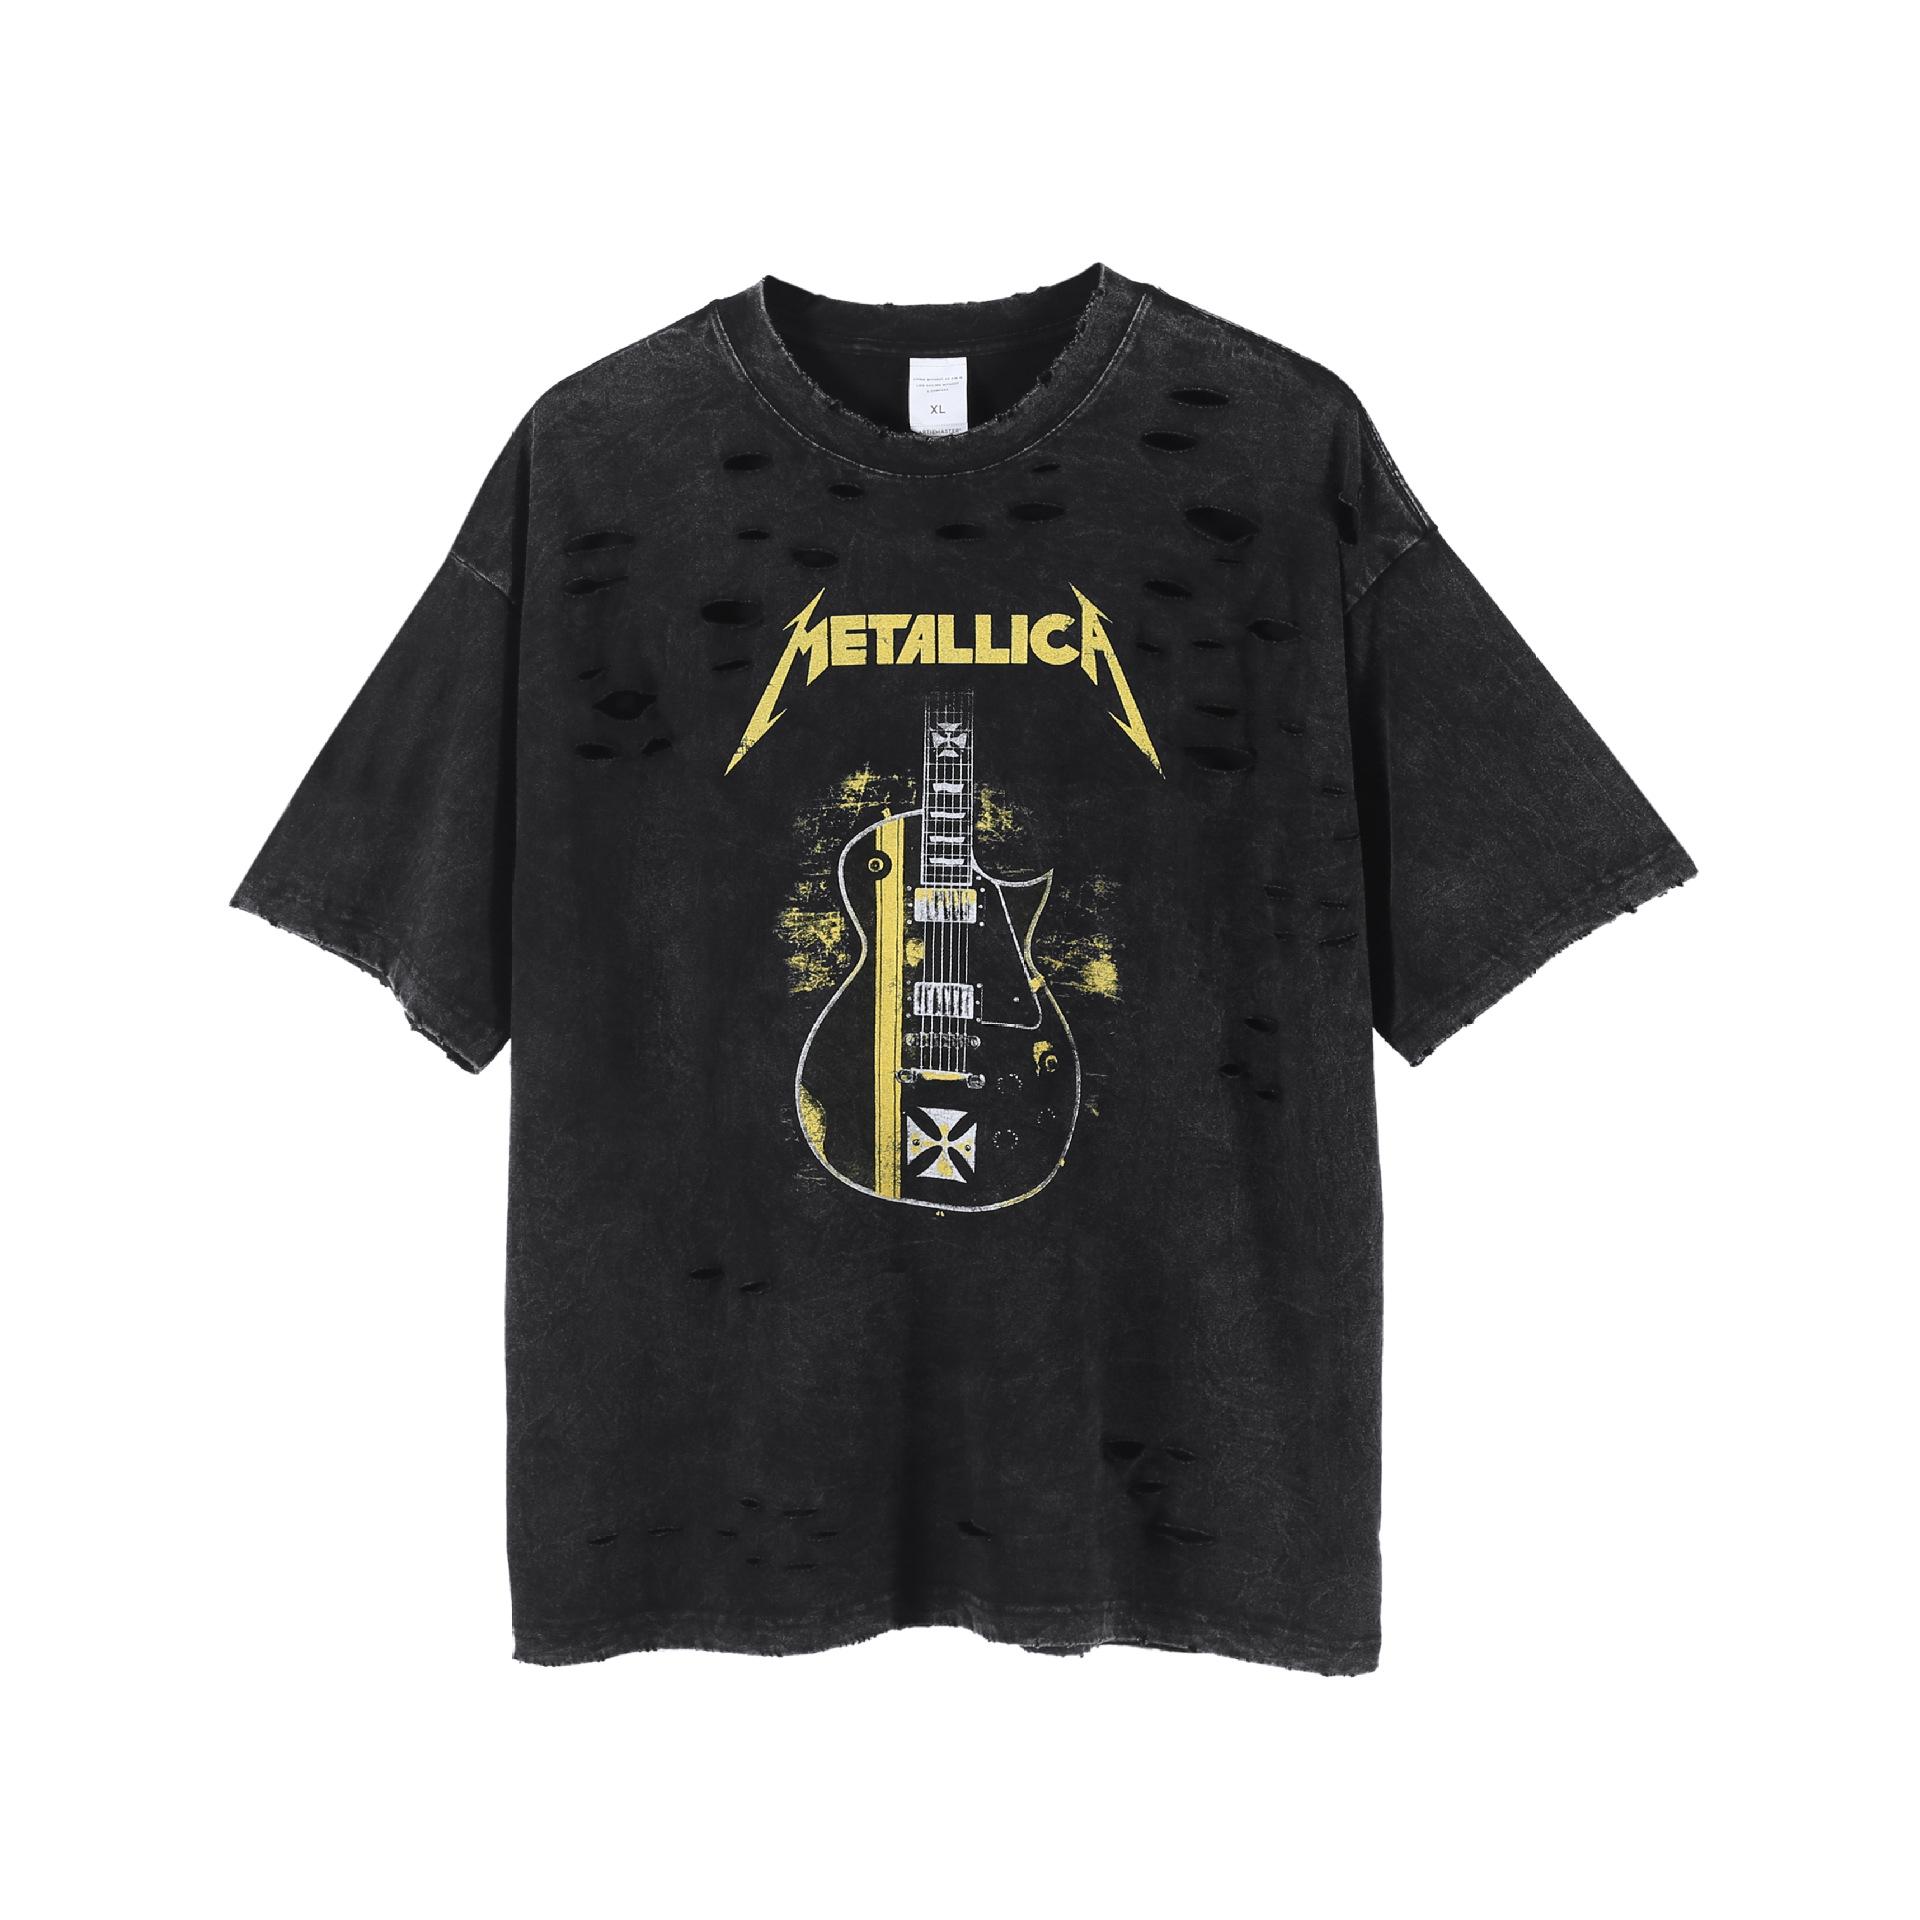 Retro Cut Band Dark High Street Printed Short Sleeve T-shirt